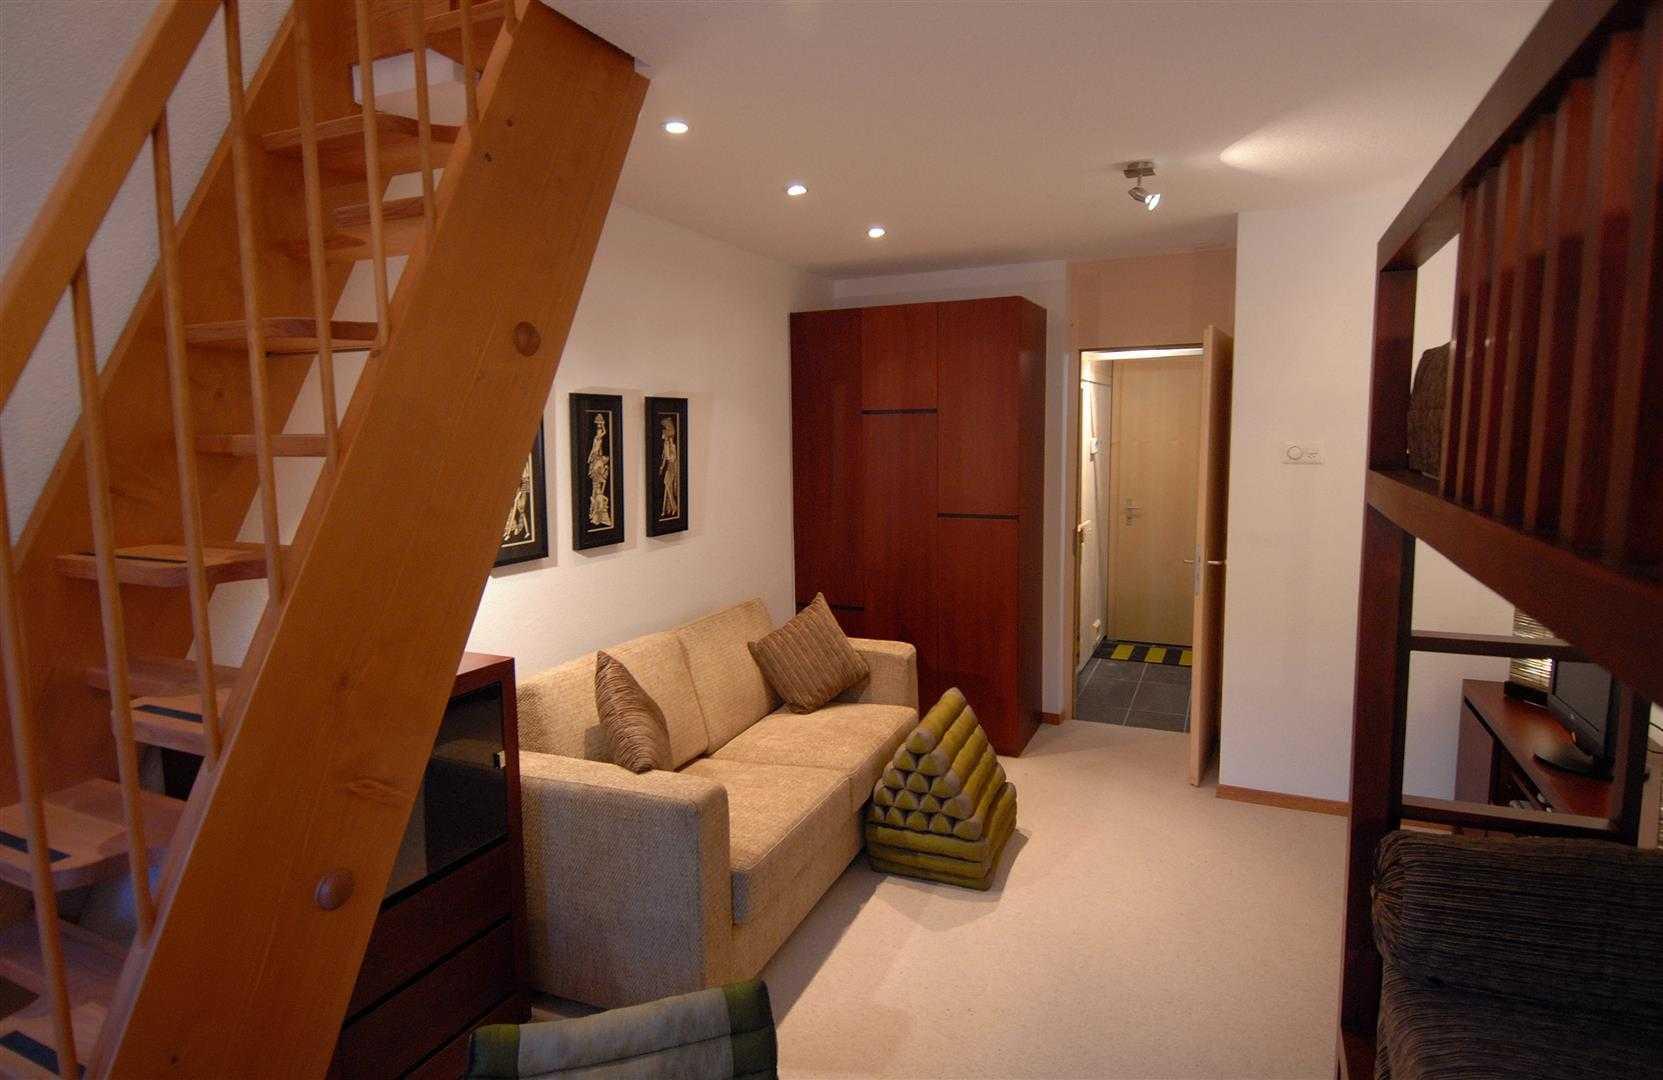 Agung Budi Raharsa | Architecture & Engineering Lenk Hotel - Switzerland Switzerland Switzerland Bedroom-4 Minimalis  12771